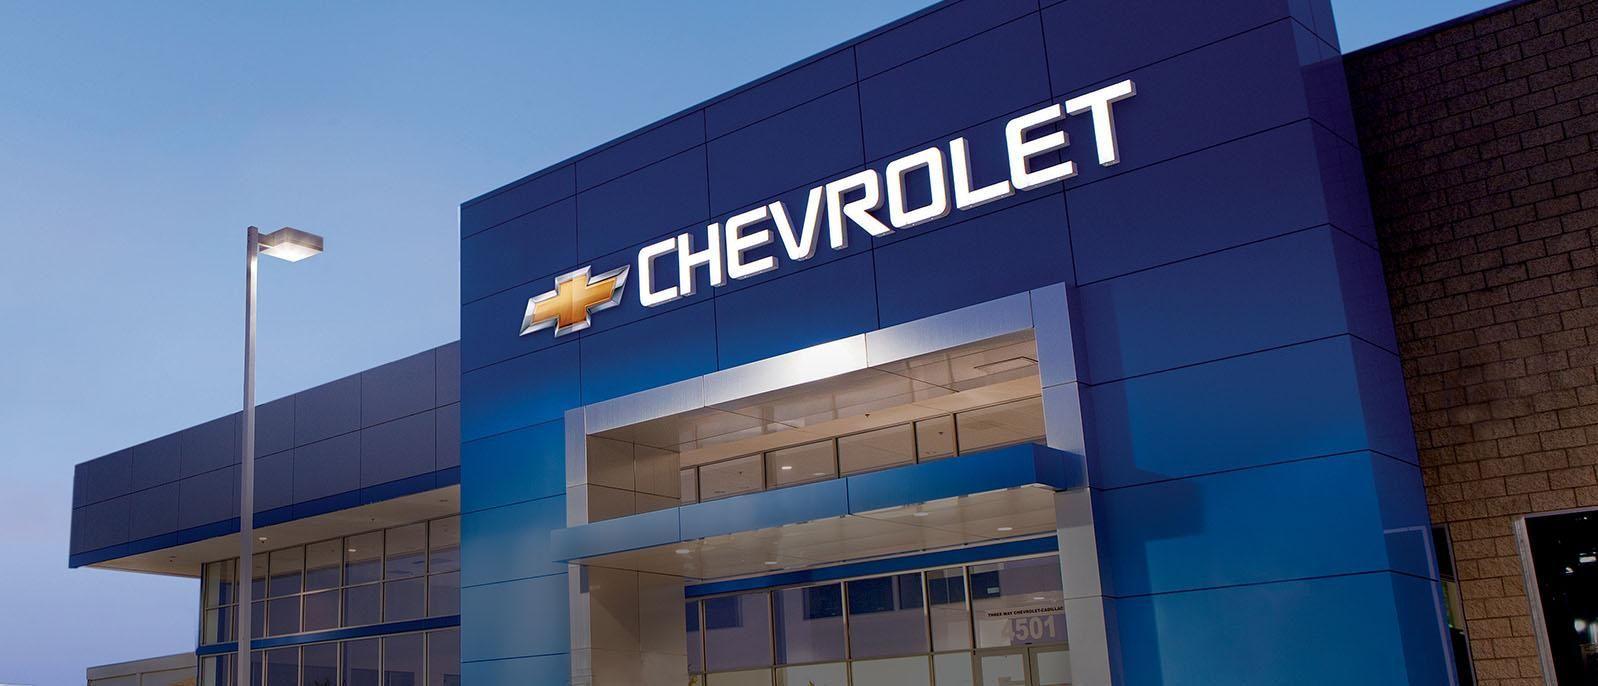 Courtesy Chevrolet Parts